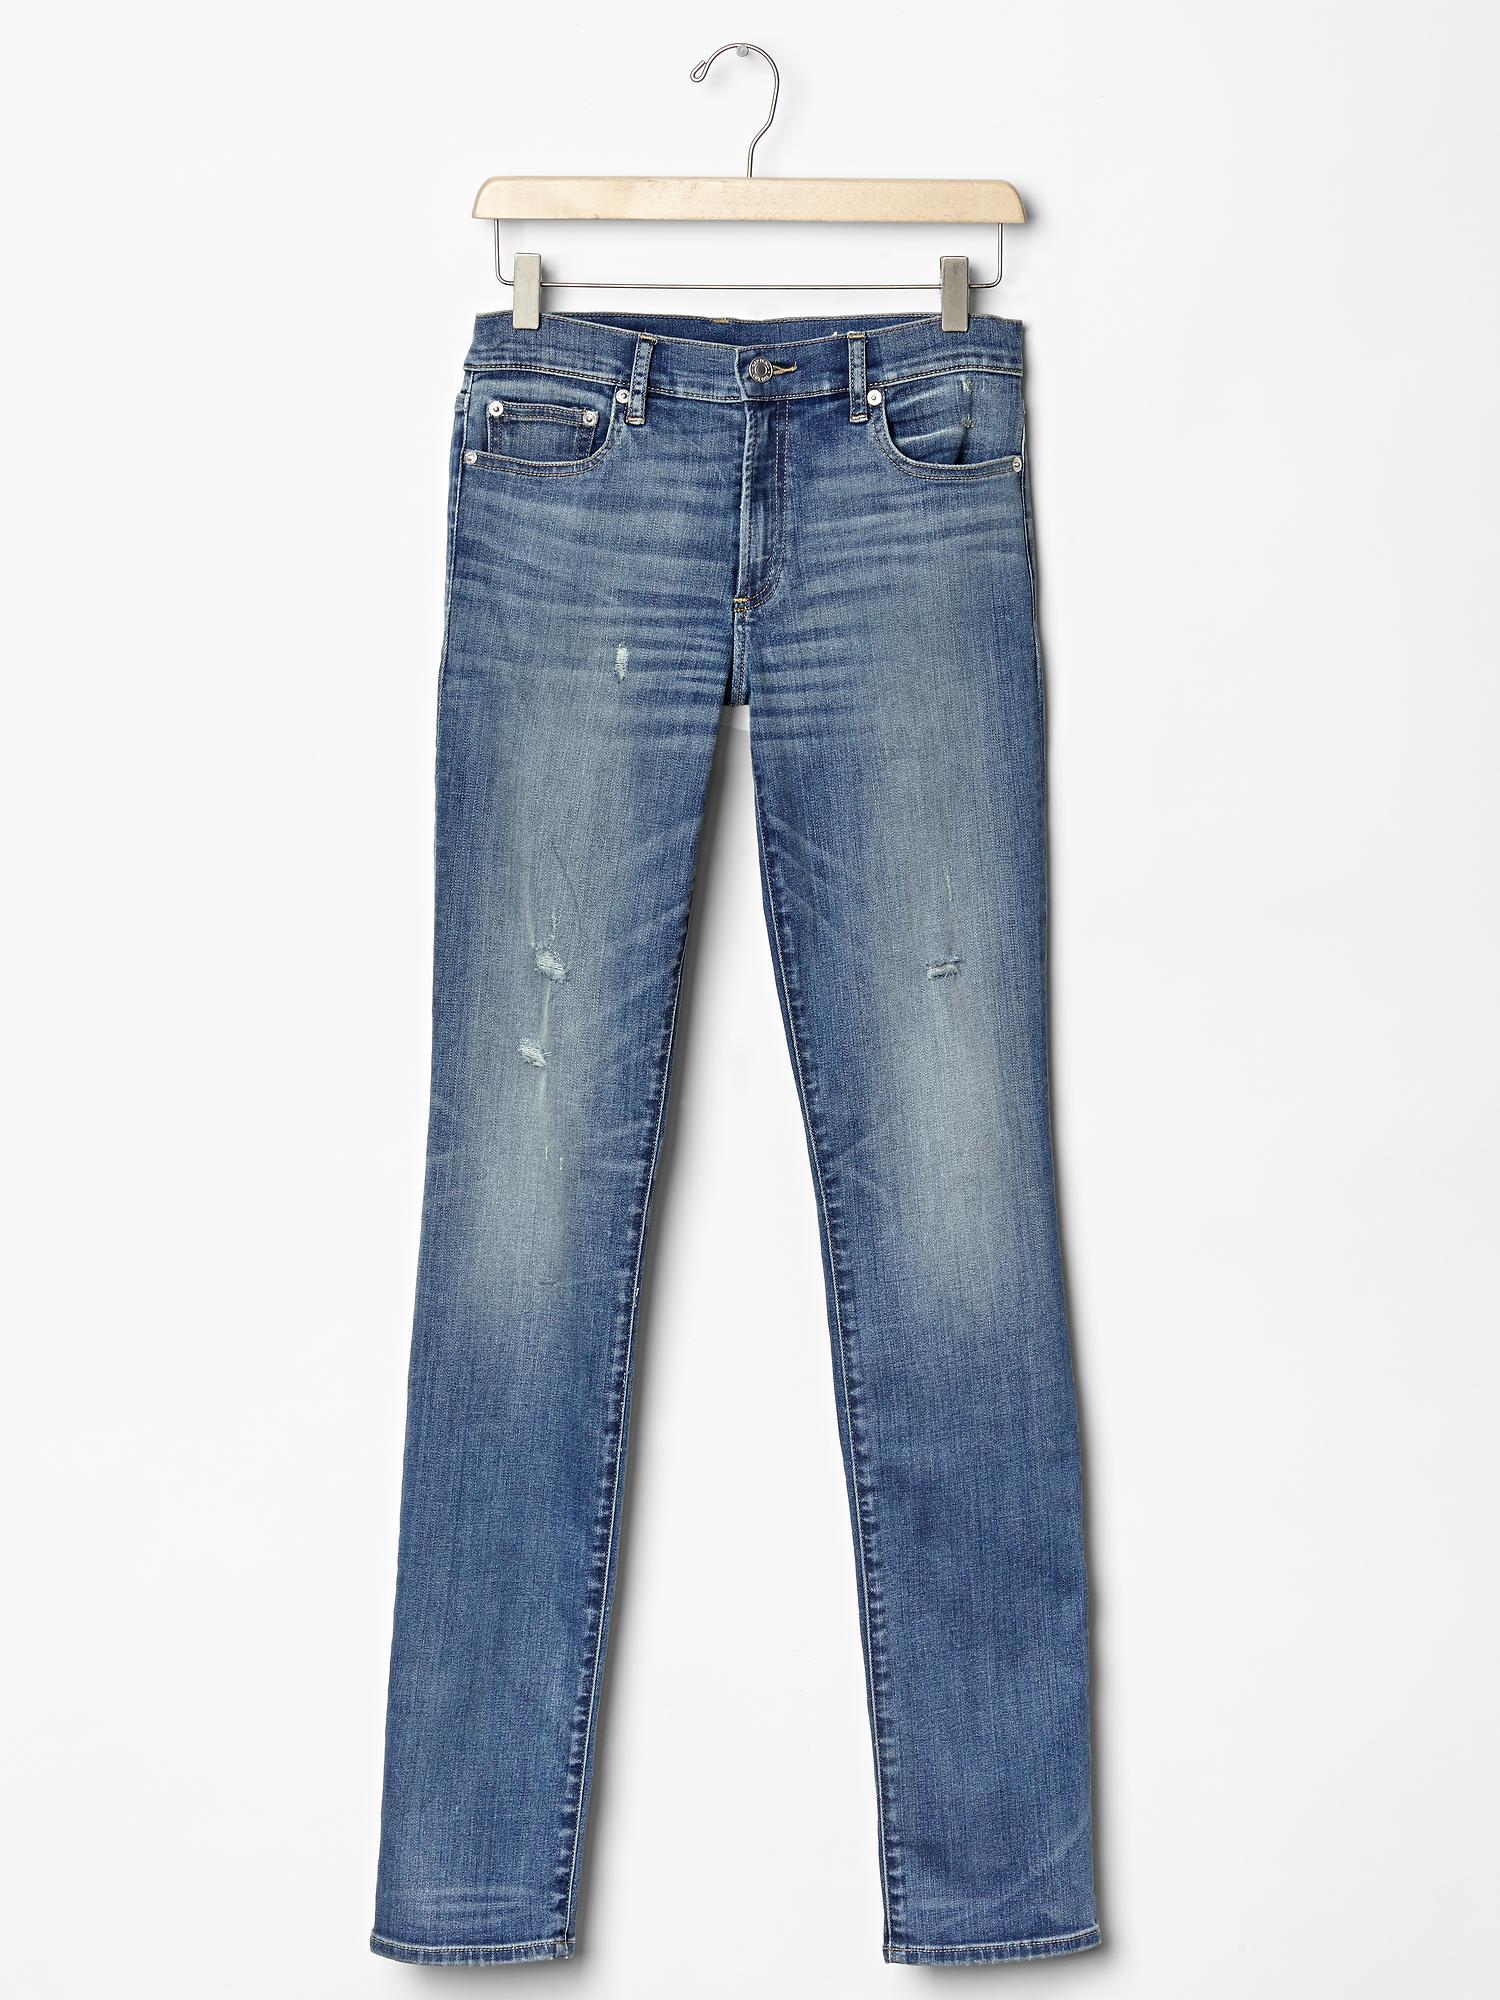 Gap 1969 Destructed Resolution Slim Straight Jeans in Blue (vintage blue) - Save 10% | Lyst